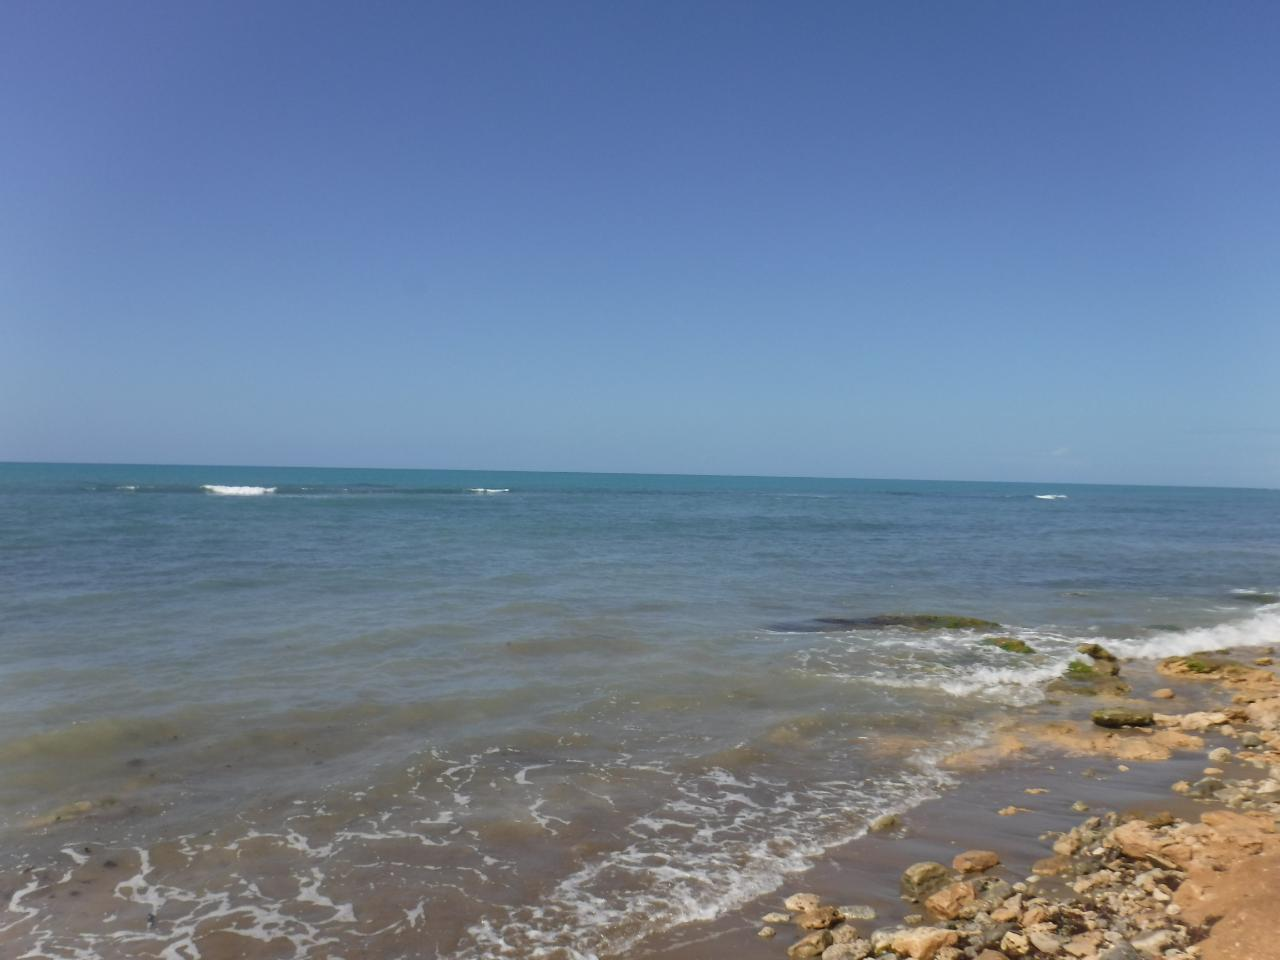 St. Elizabeth, Treasure Beach image - 1